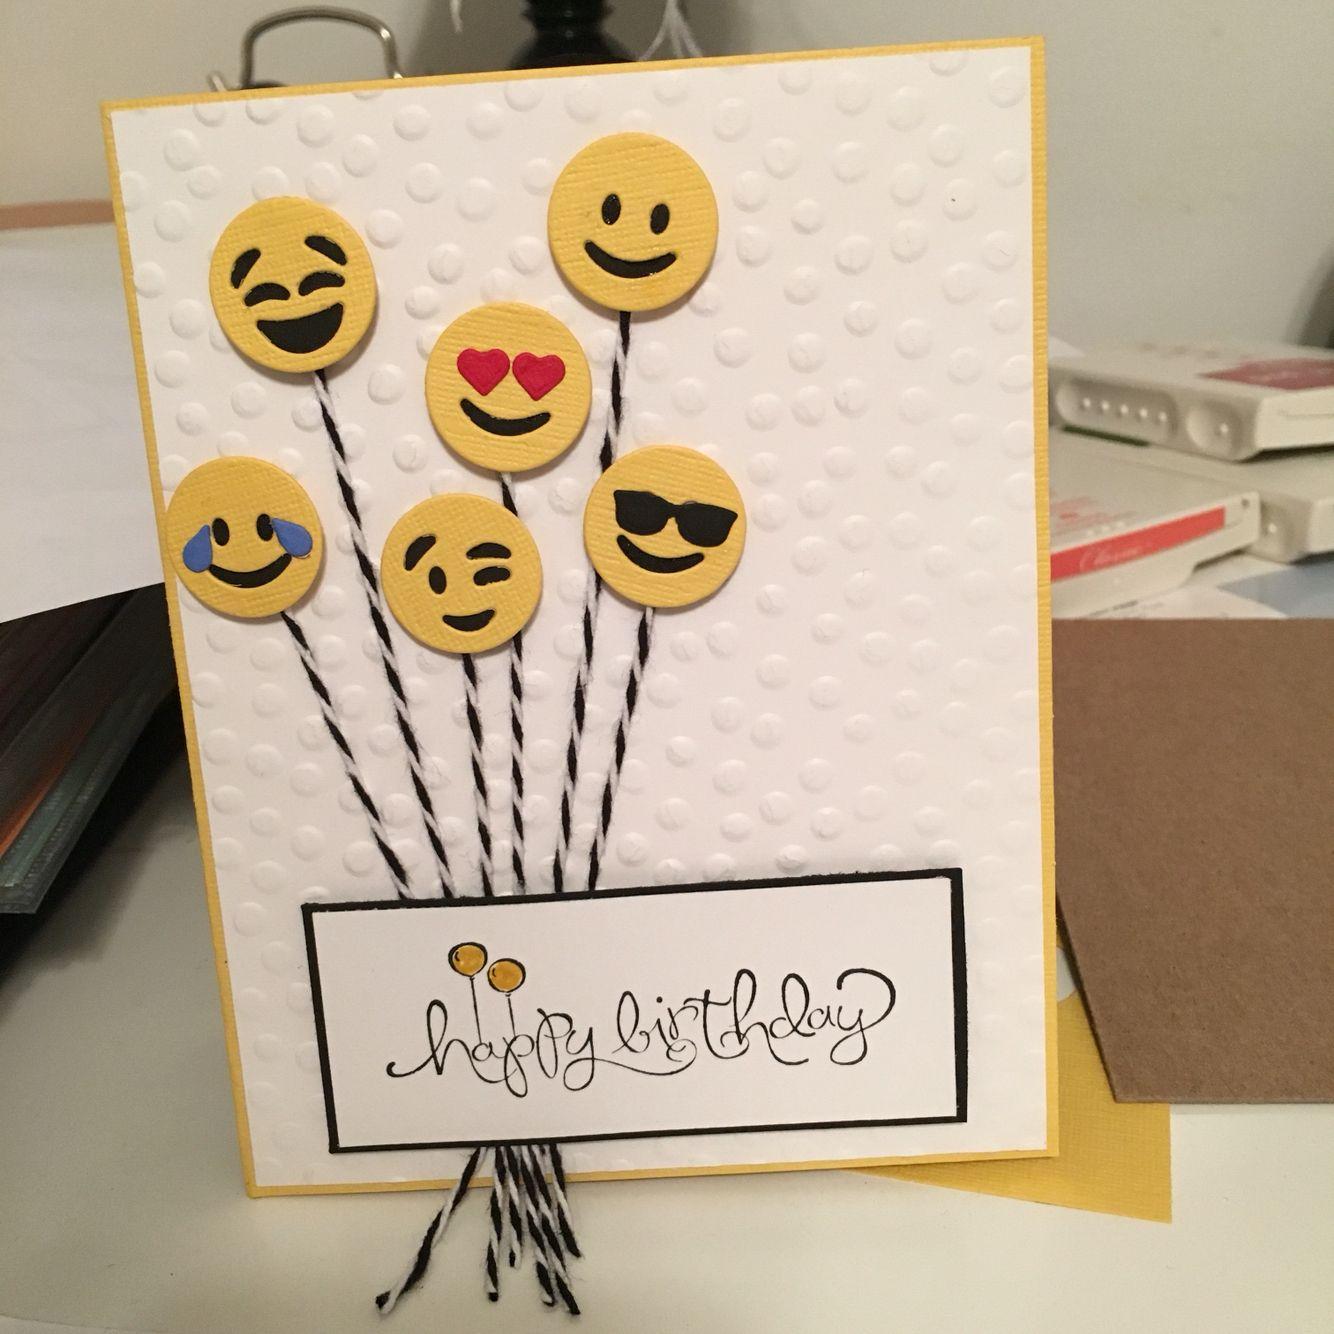 Emoji Card 7/21/16